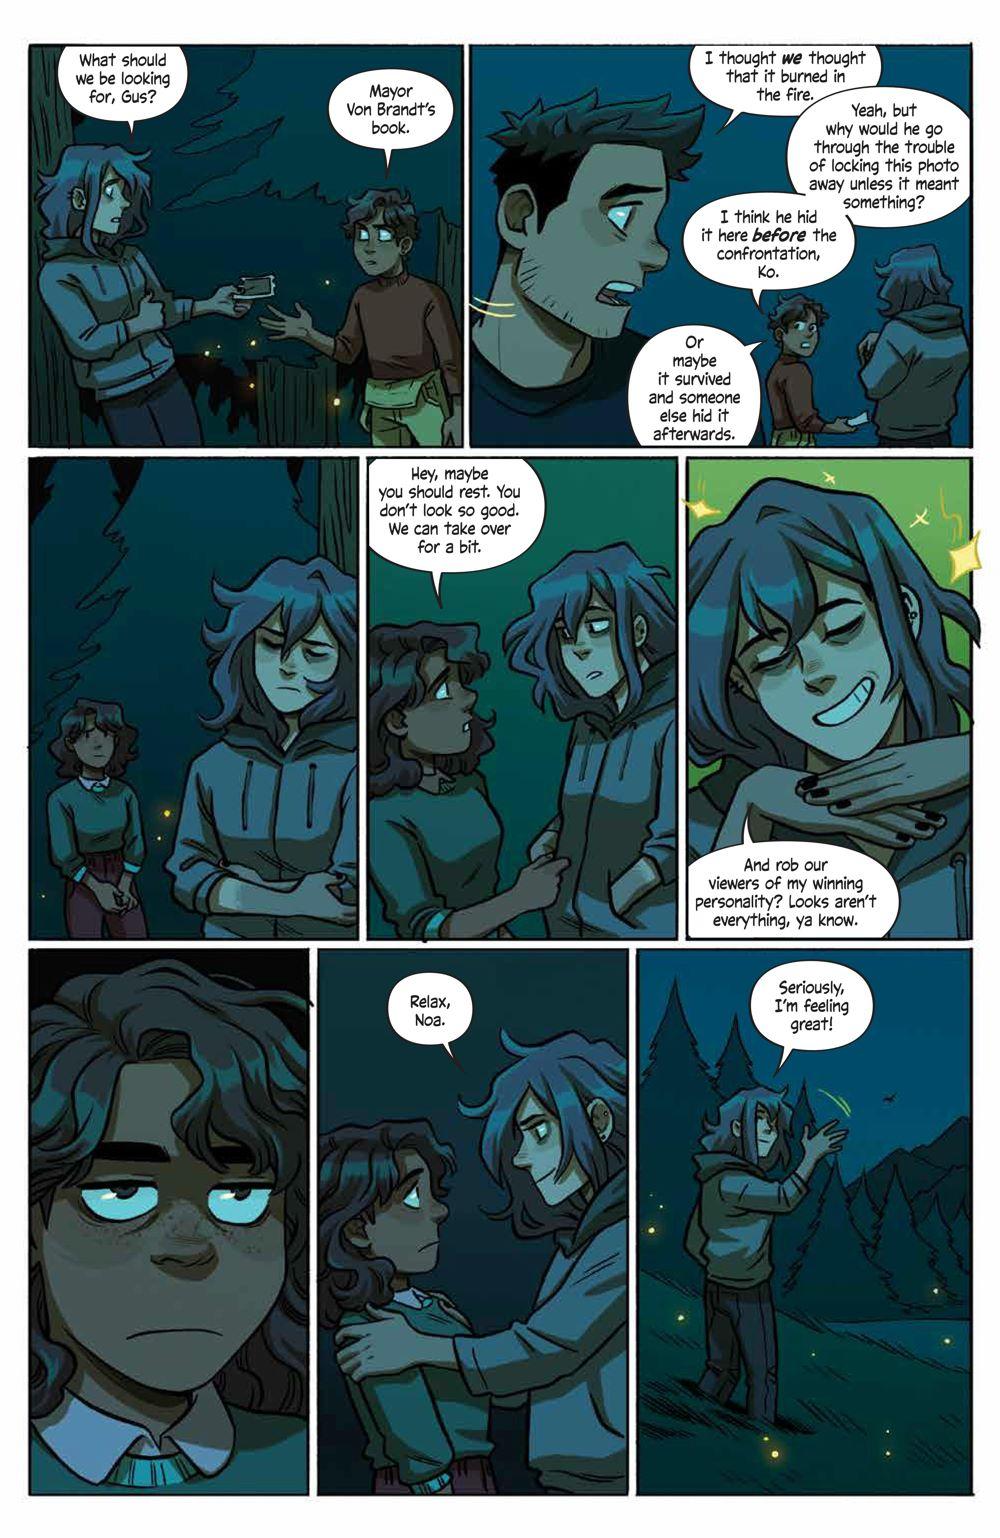 SpecterInspectors_004_PRESS_5 ComicList Previews: SPECTER INSPECTORS #4 (OF 5)